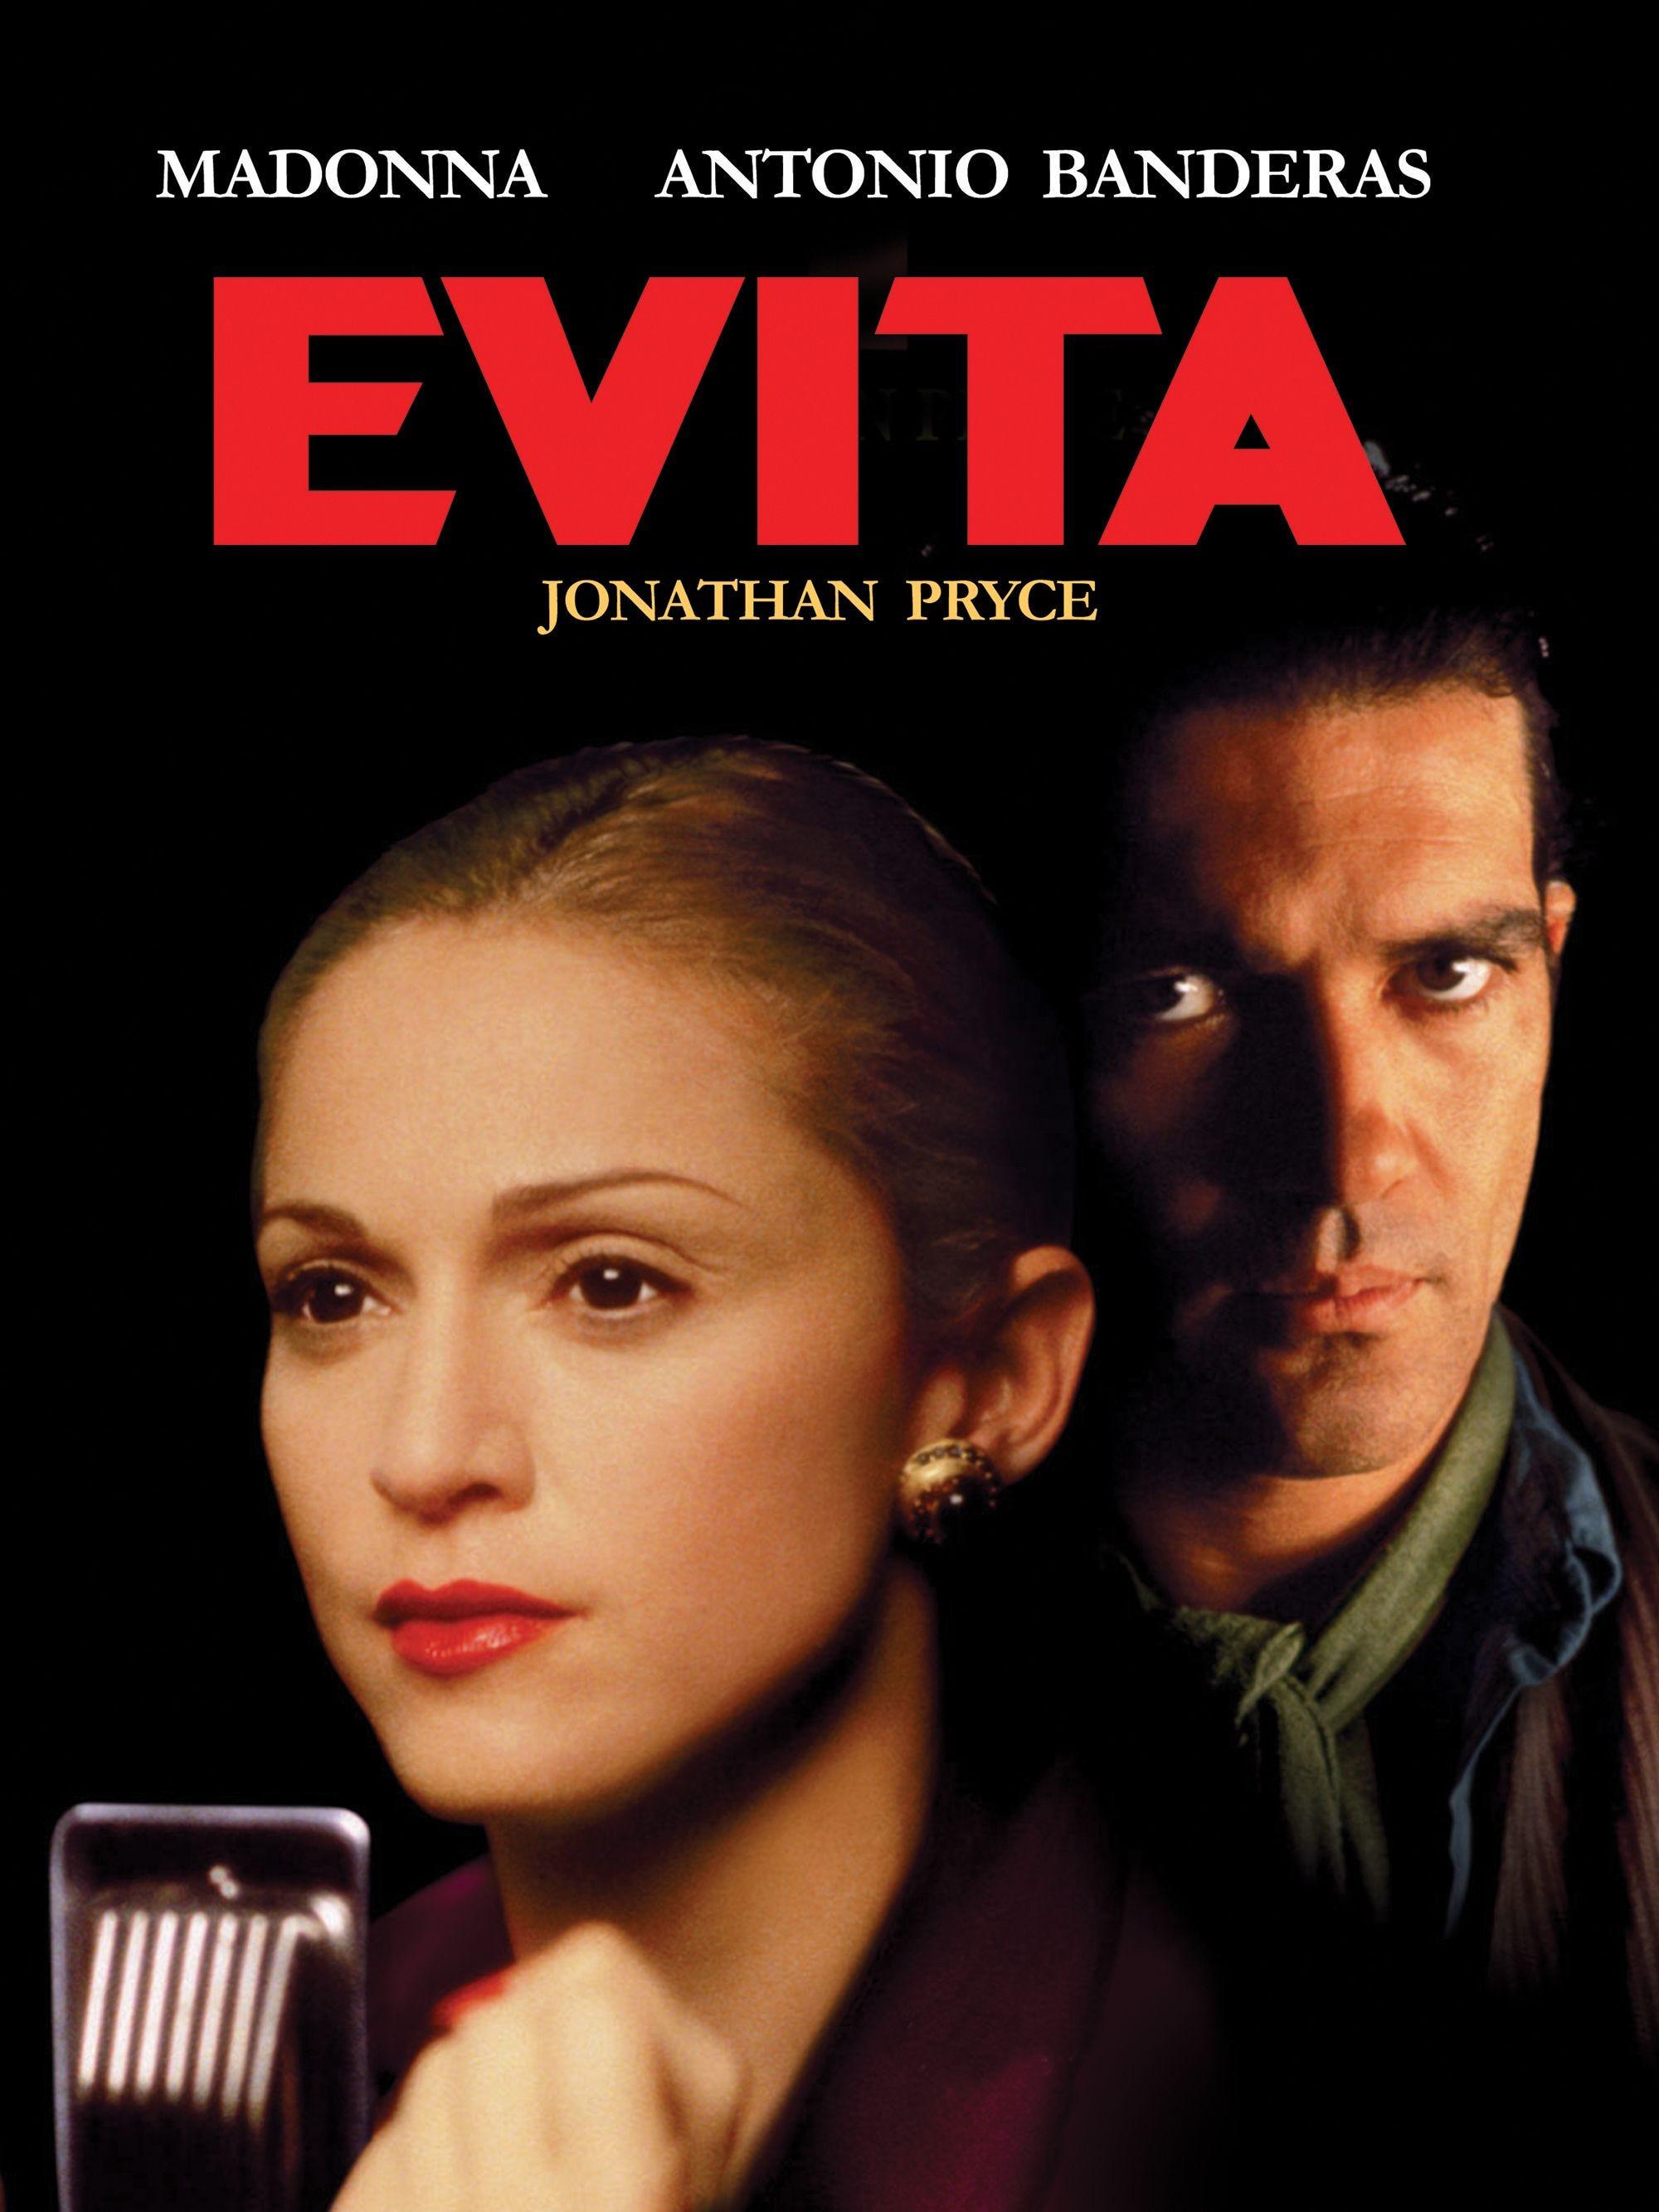 "Madonna Argentina Movie : madonna, argentina, movie, Evita""., Browsing, Channels, Some…, Jeanalyn, Sandler, KeepIt112, Medium"